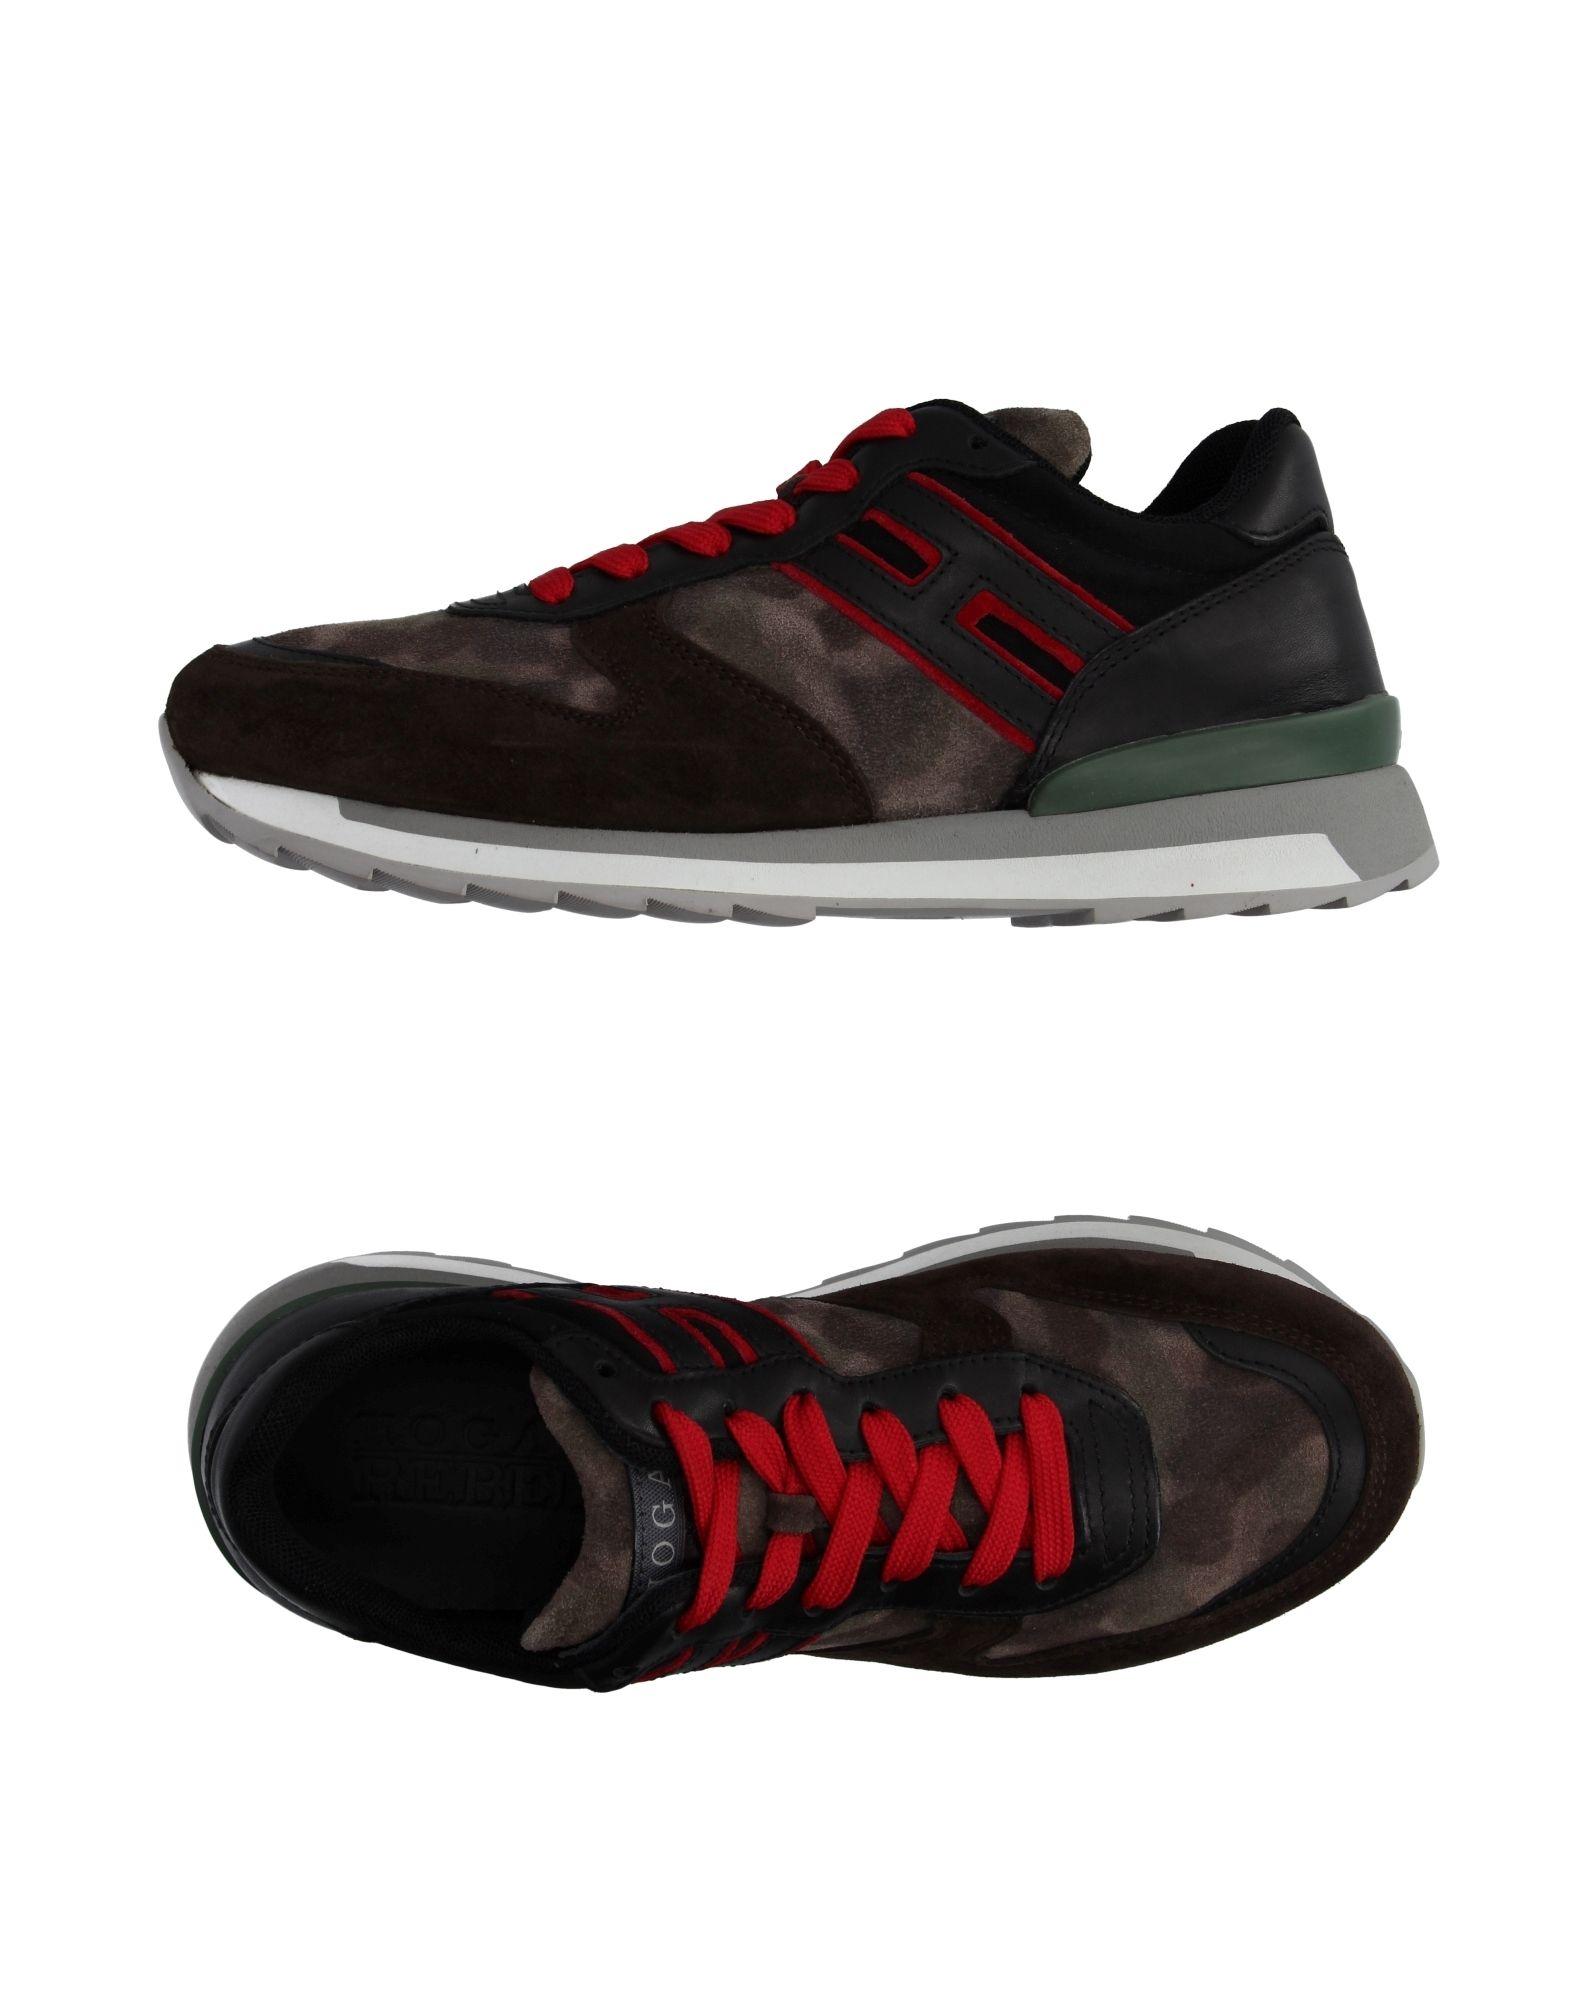 Hogan Hogan Hogan Rebel Sneakers - Men Hogan Rebel Sneakers online on  United Kingdom - 11038516MI 882fae